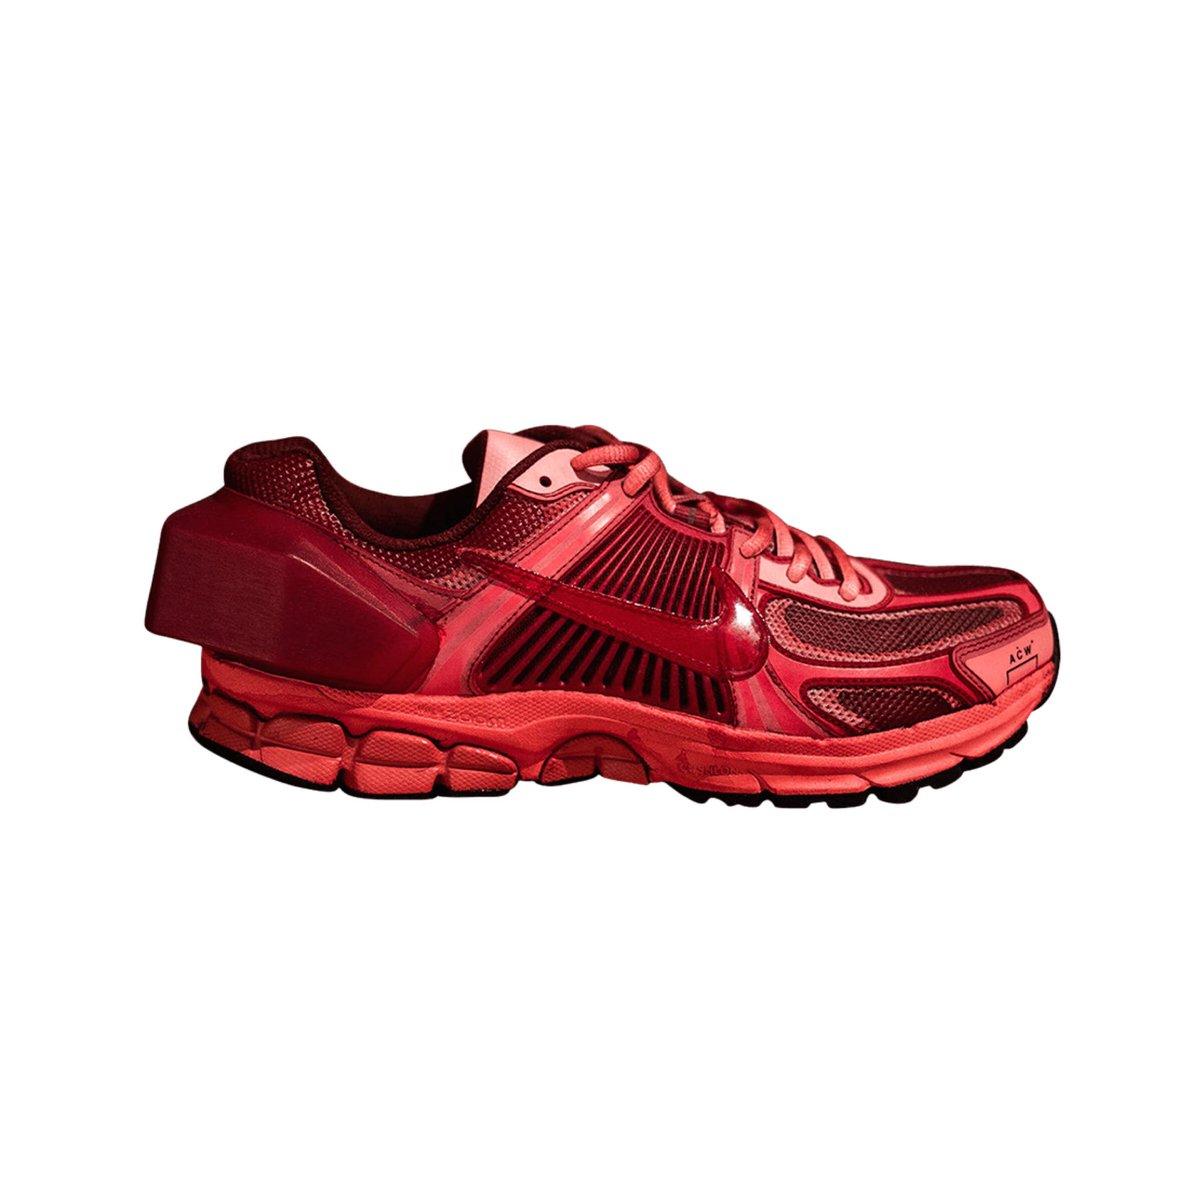 de706e41c3dc3 Nike X A-Cold-Wall Zoom Vomero 5 COLOR   Red PRICE   10900